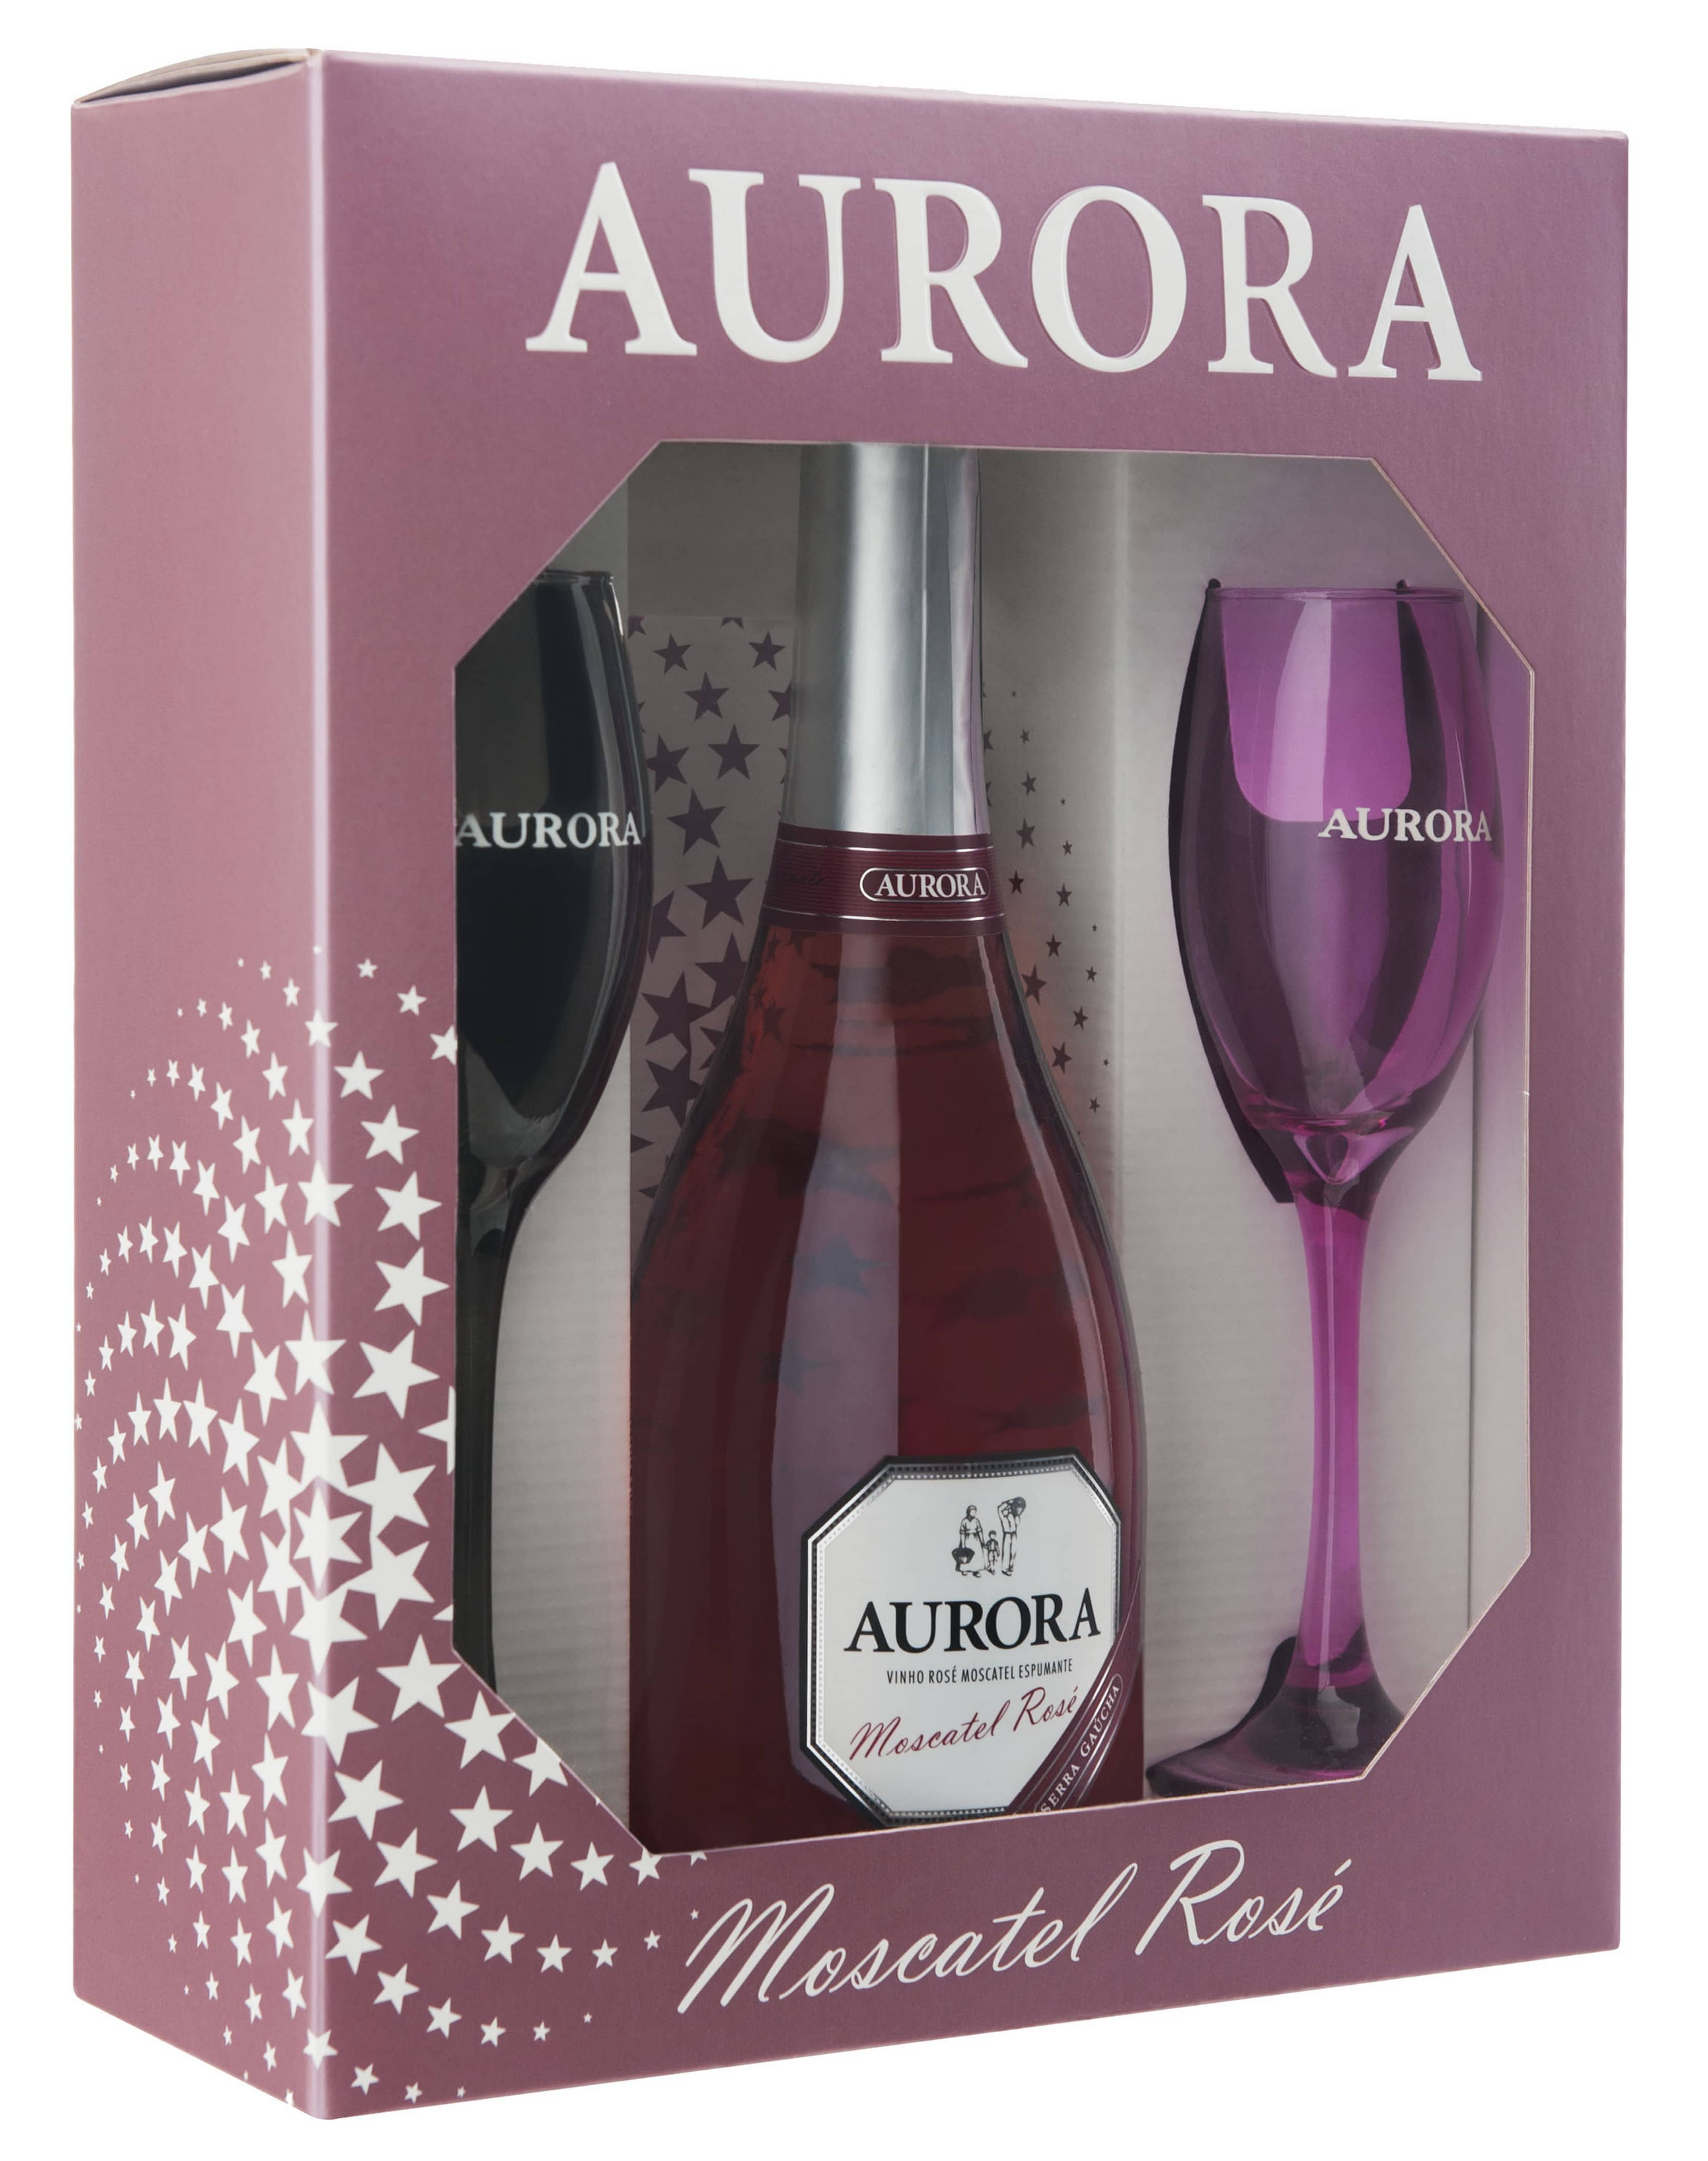 Maleta-Aurora-Moscatel-Rose